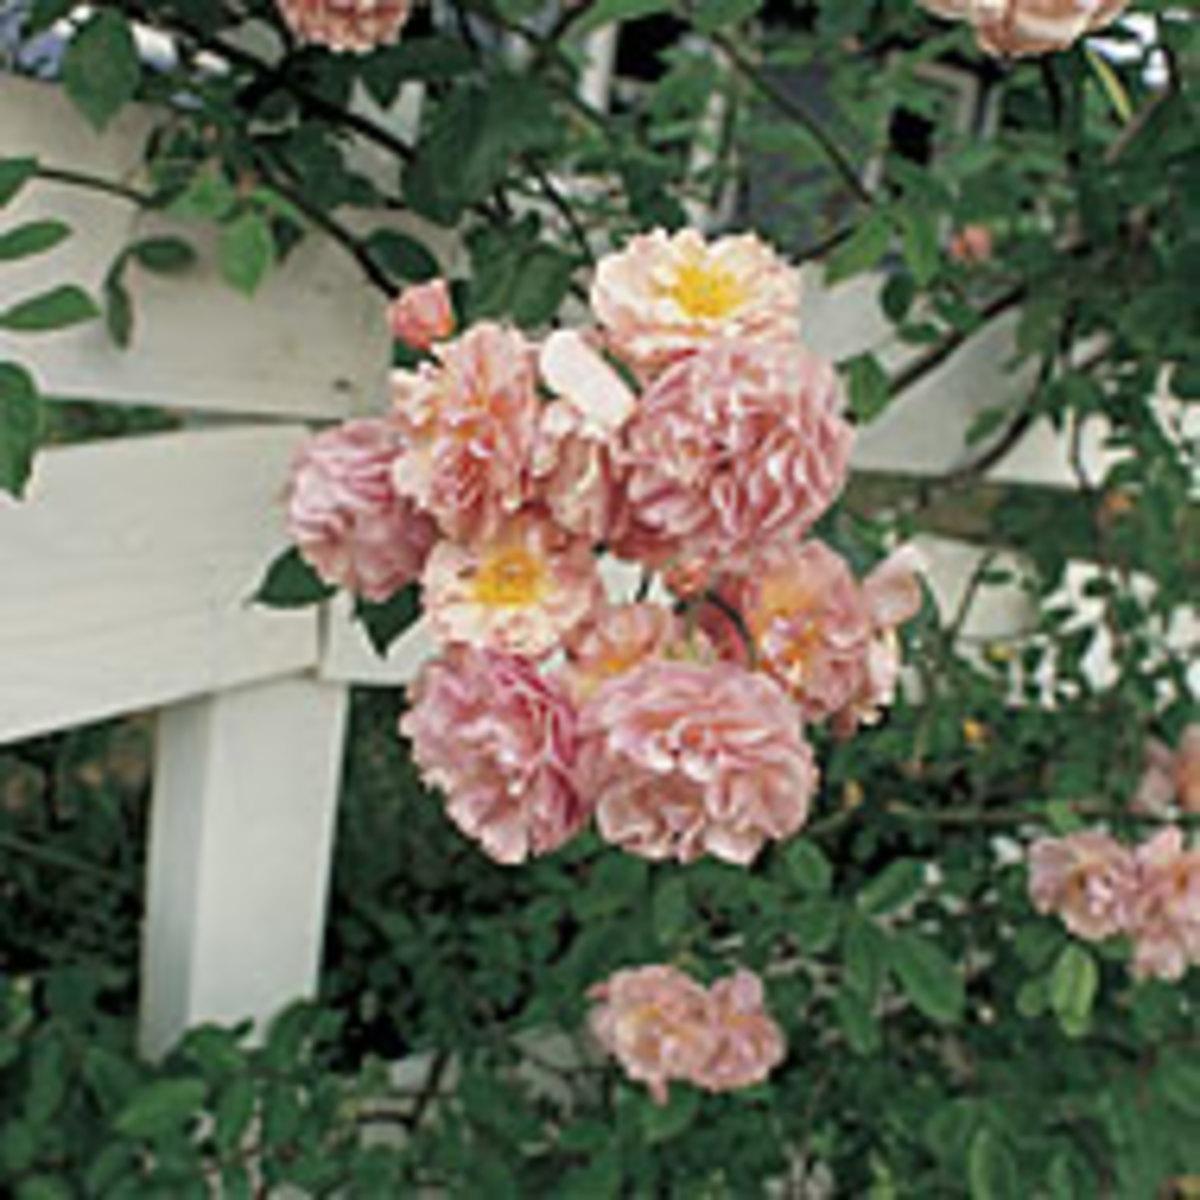 cornelia-rose-a-hybrid-musk